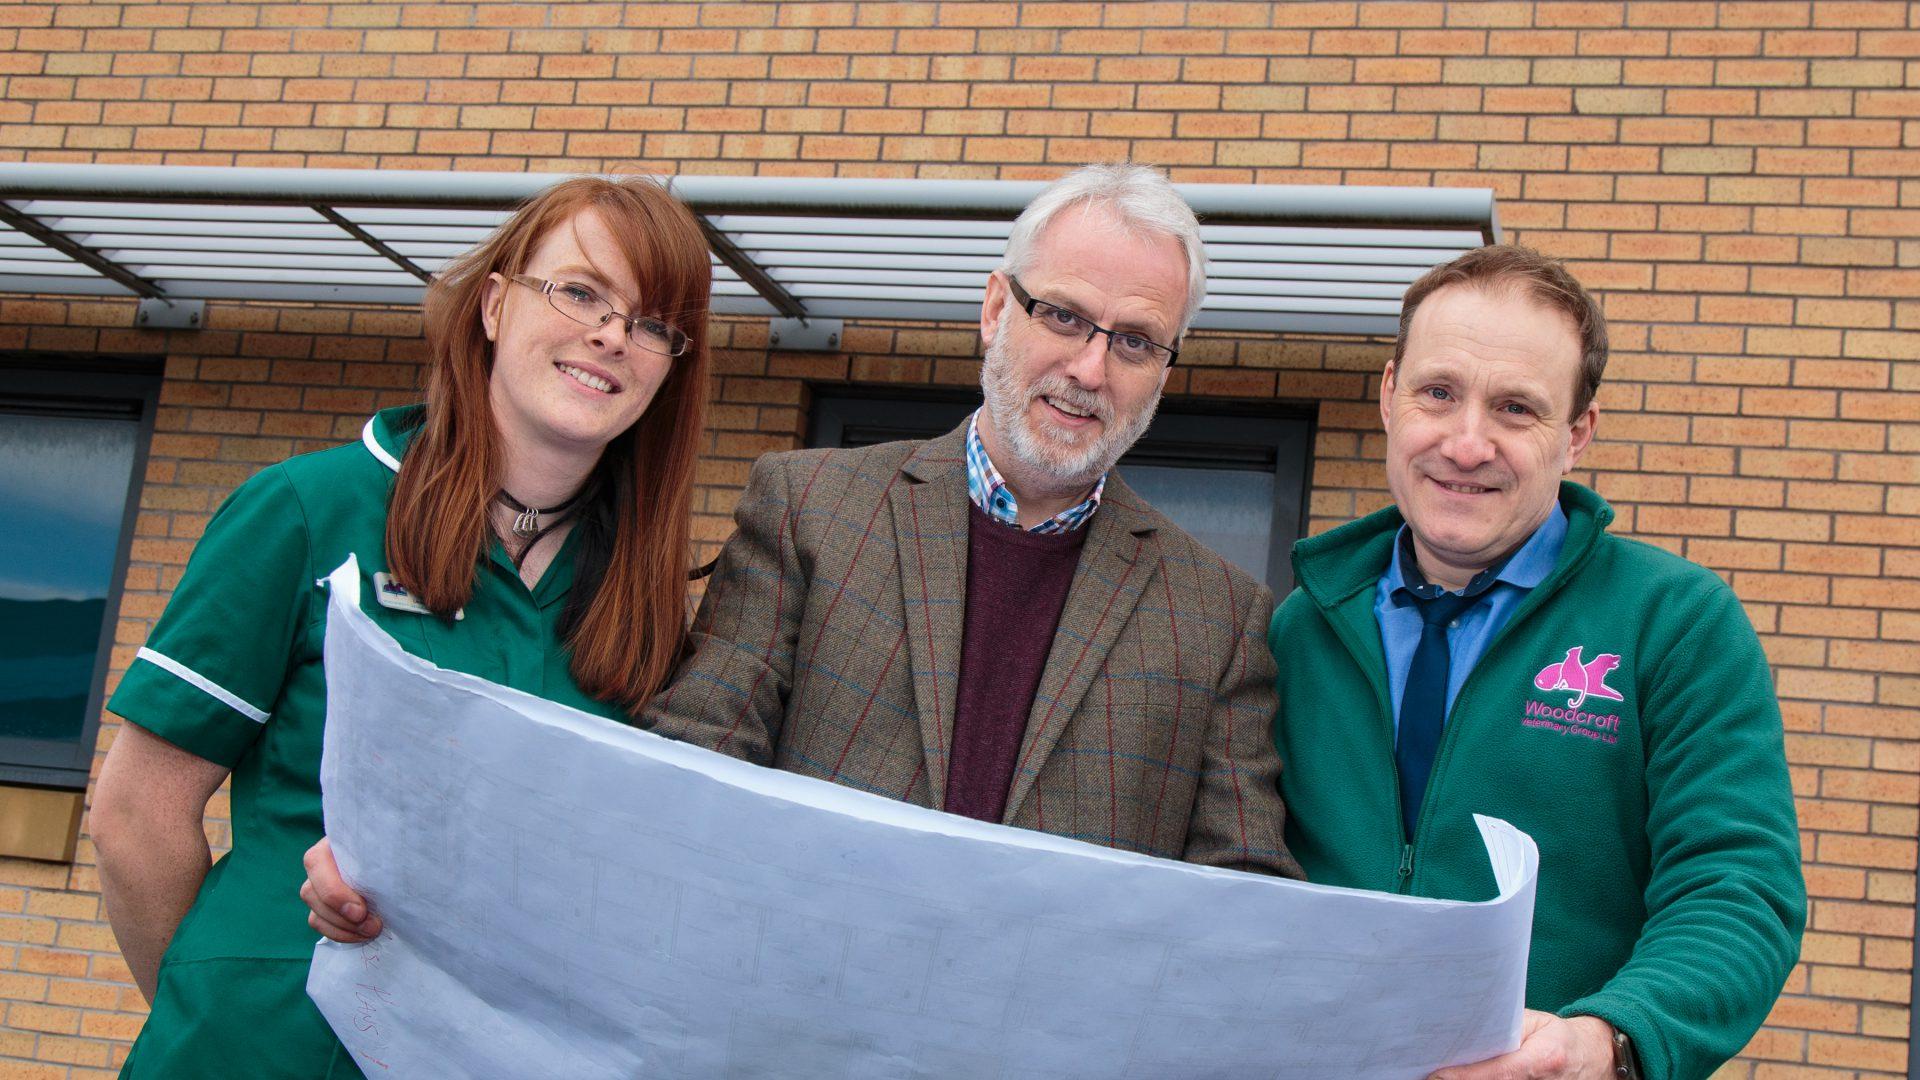 New £2.5m Cheshire veterinary hospital marks major investment by VetPartners